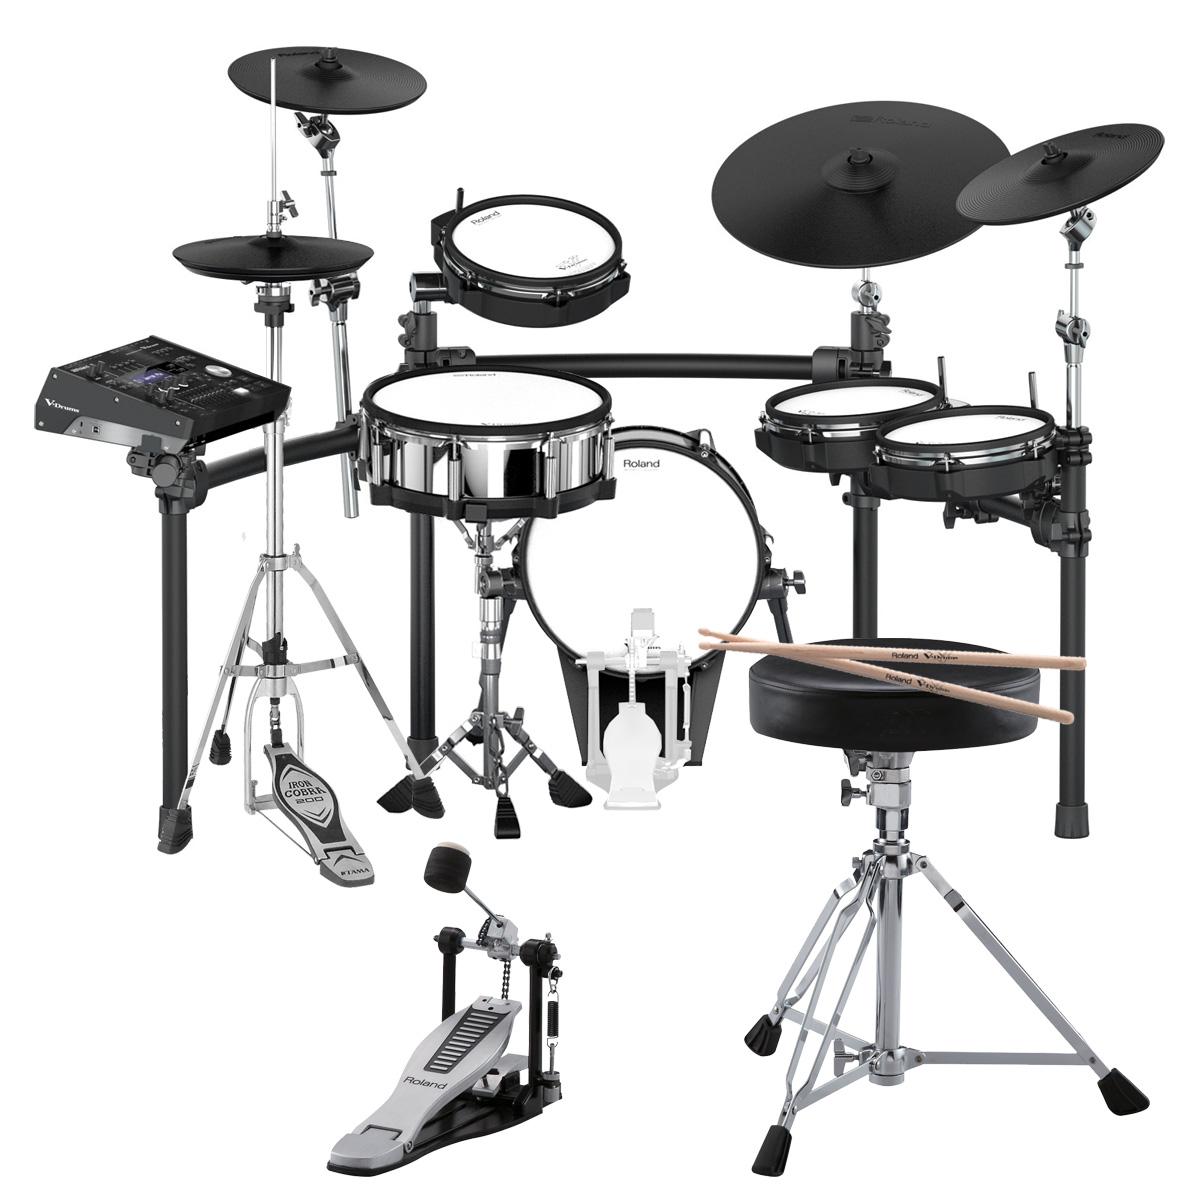 Roland Drum System TD-50K カスタム VH-13ハイハット KD-140-BC MDS-50K セット【TD-50ハードウェアプレゼントキャンペーン対象品商品】【YRK】